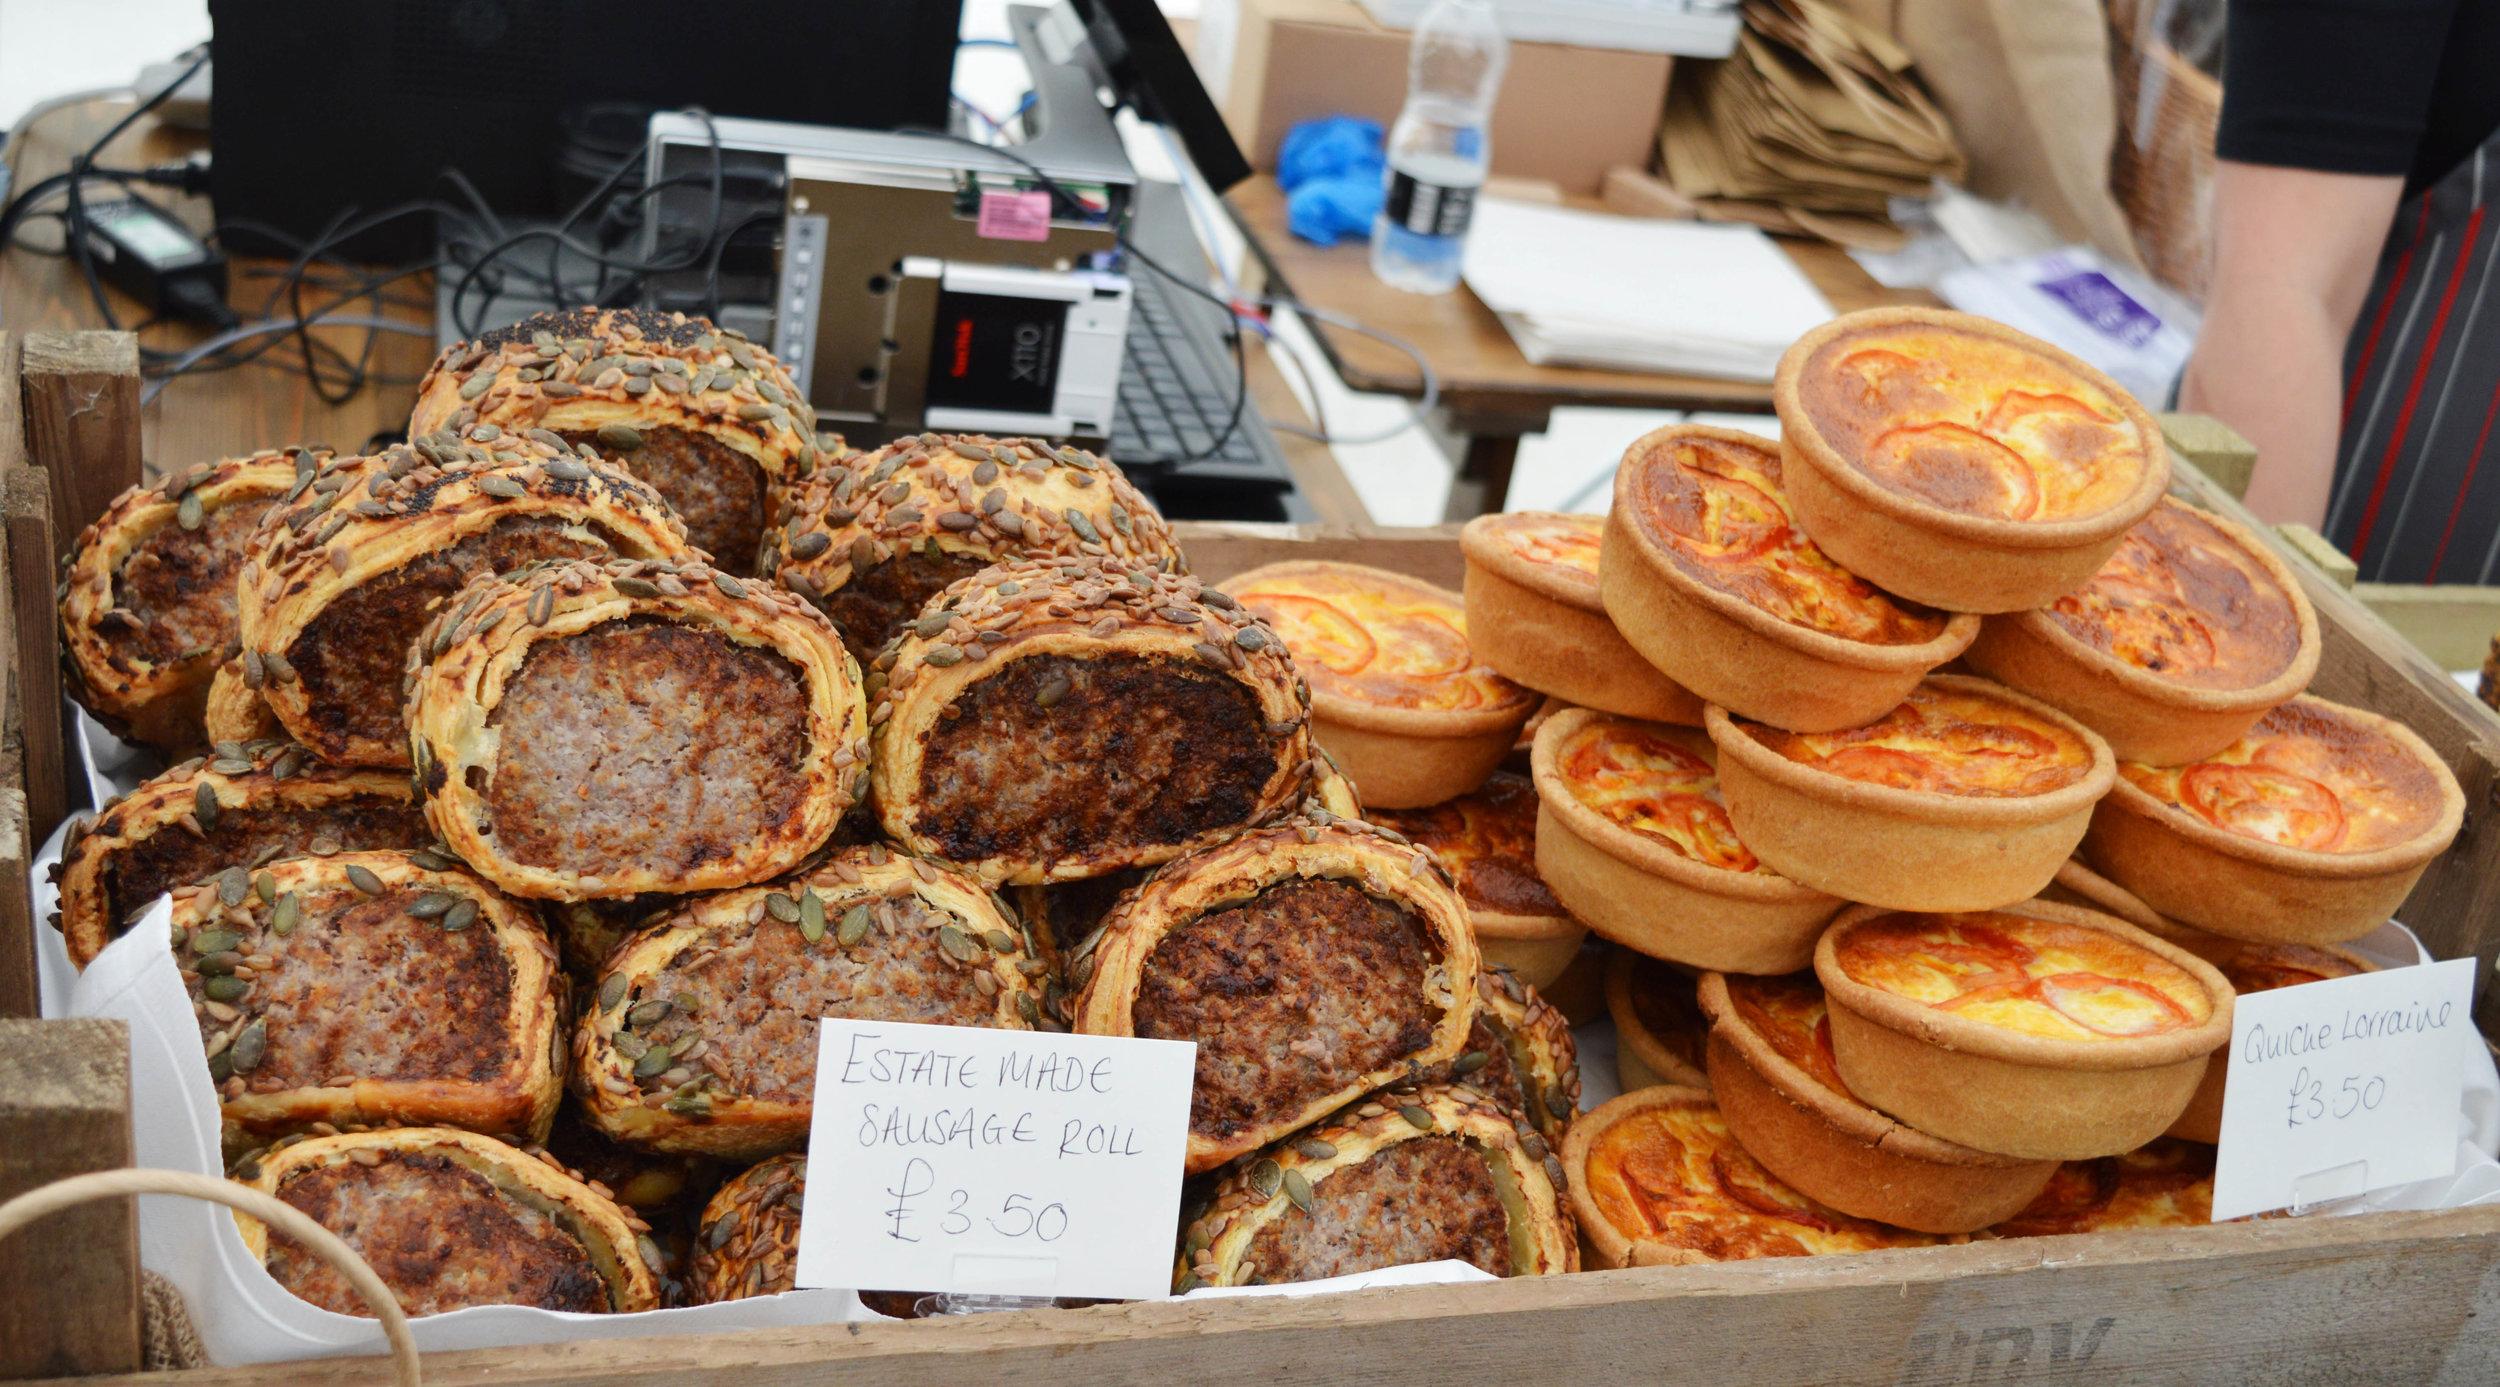 The 10 (Food Festival) Commandments - 4: Thou shalt sample and buy